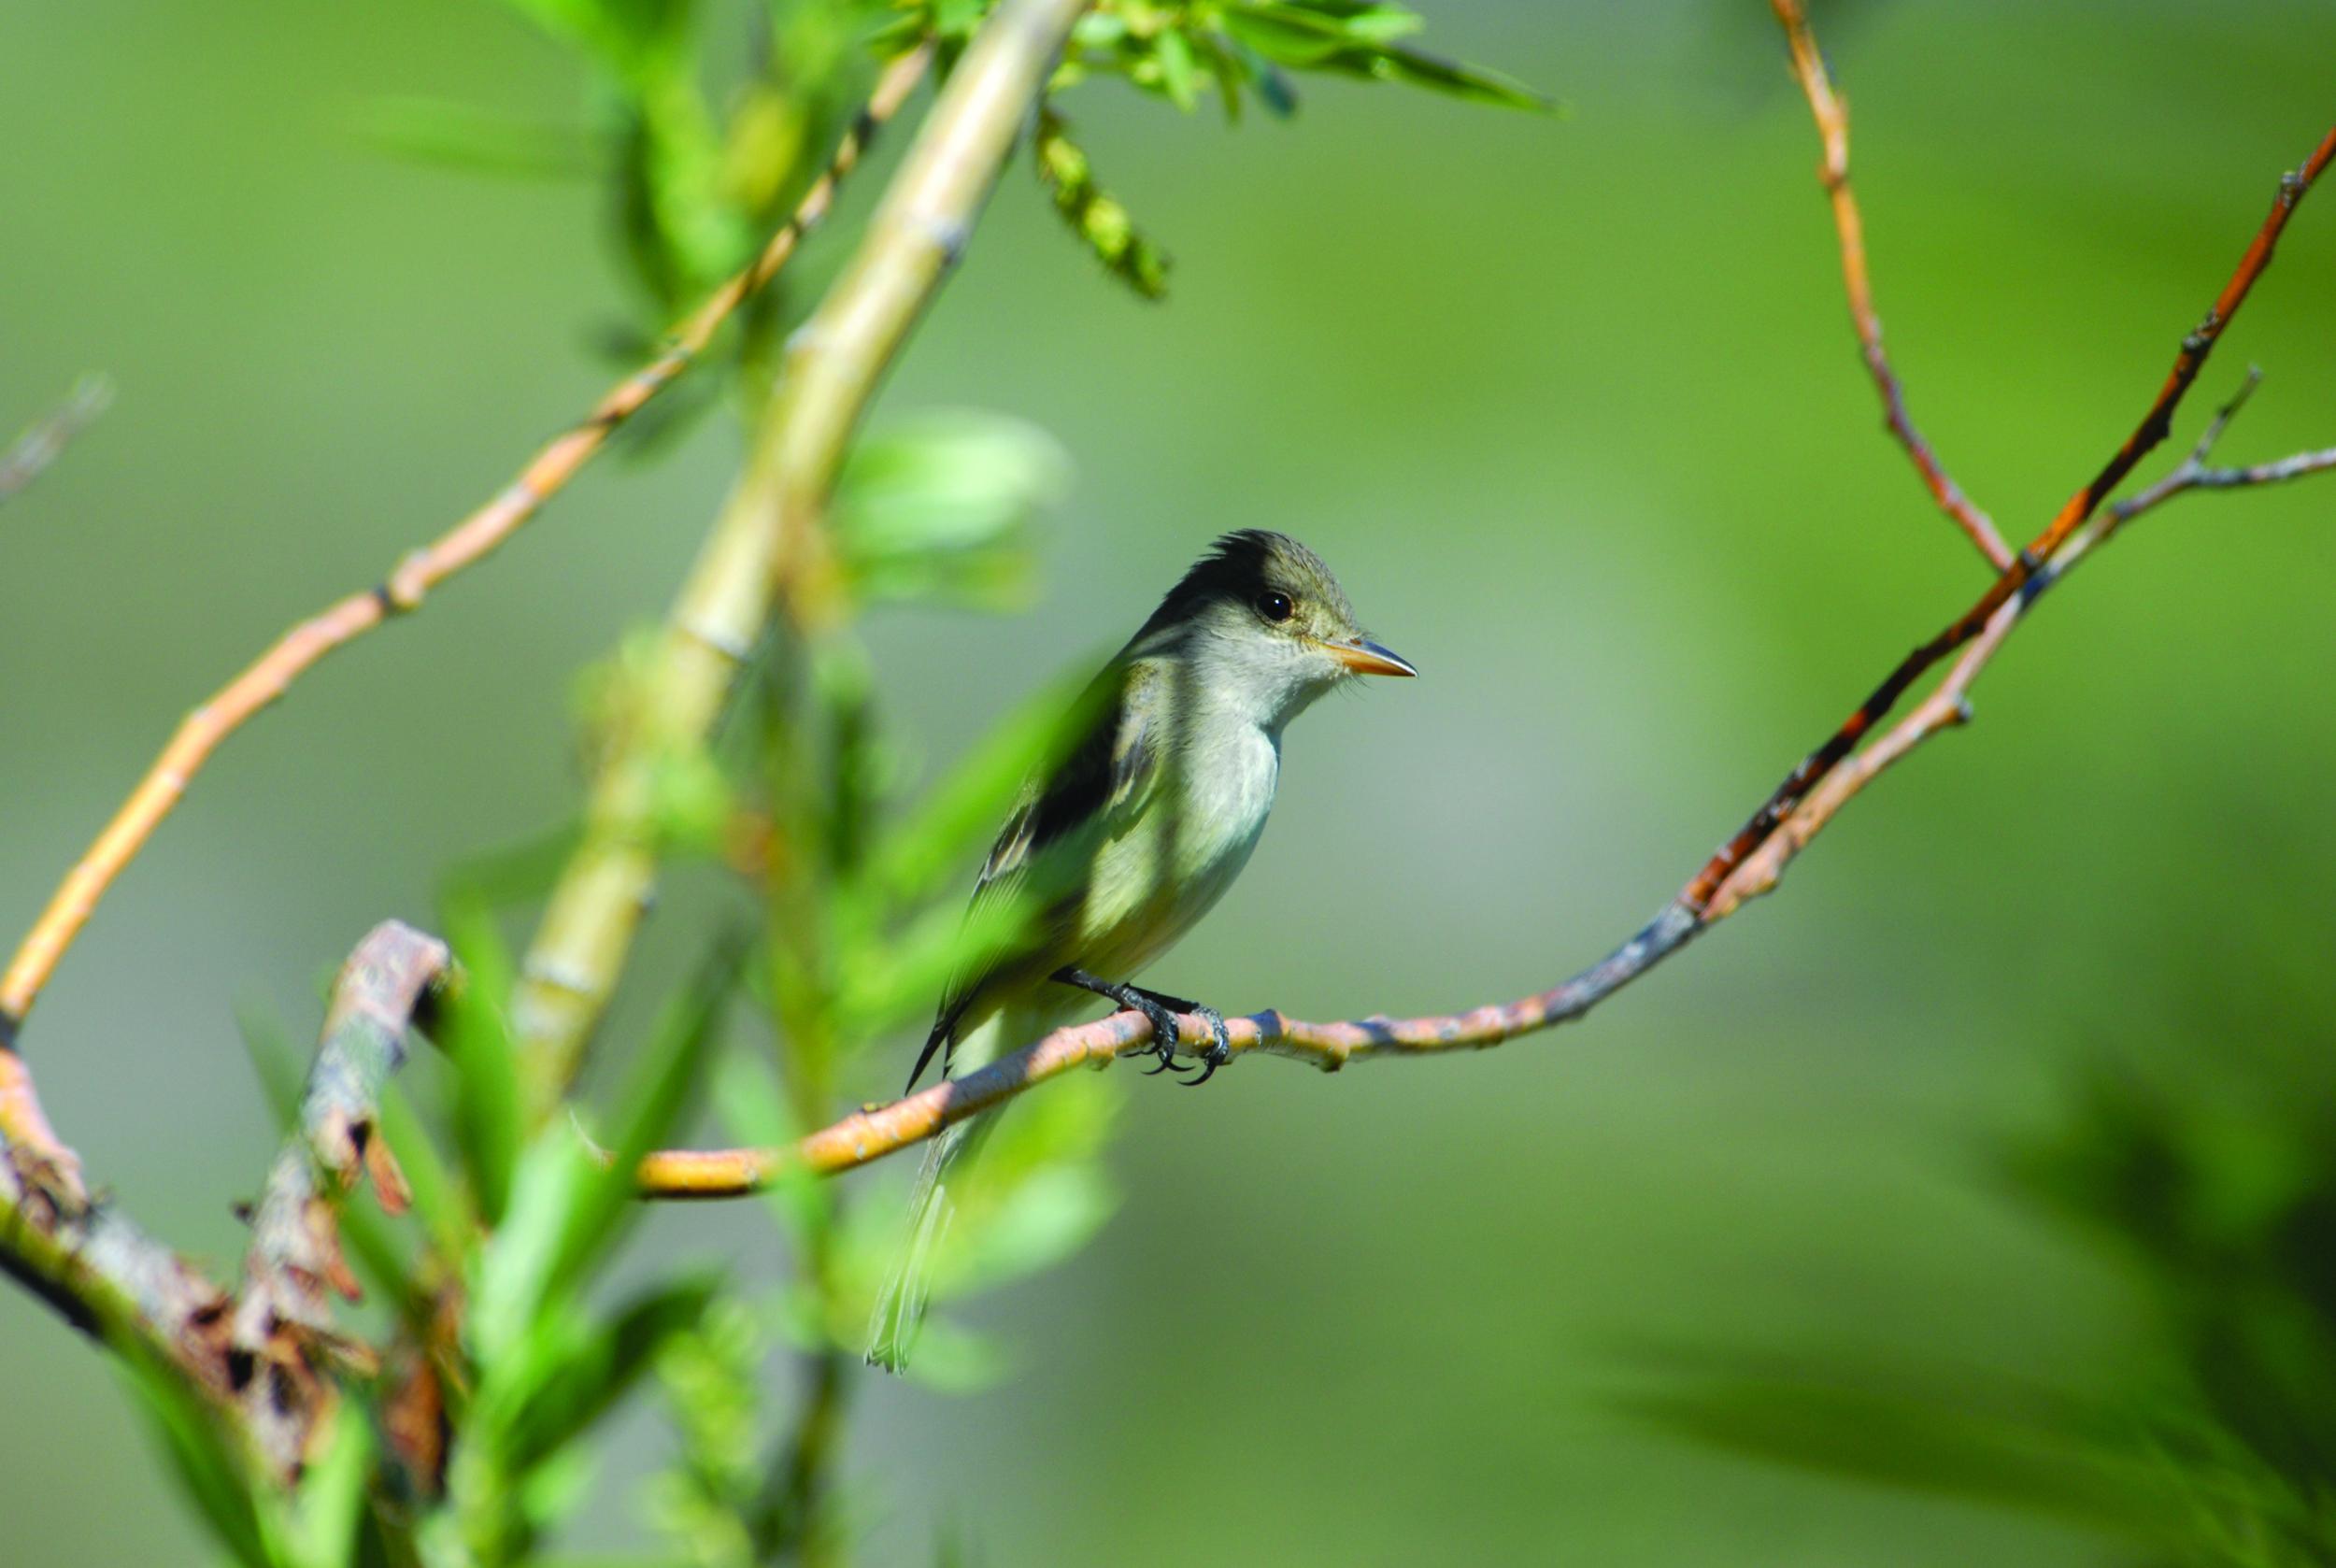 Willow Flycatcher - Photo: Davide Menke, USFWS